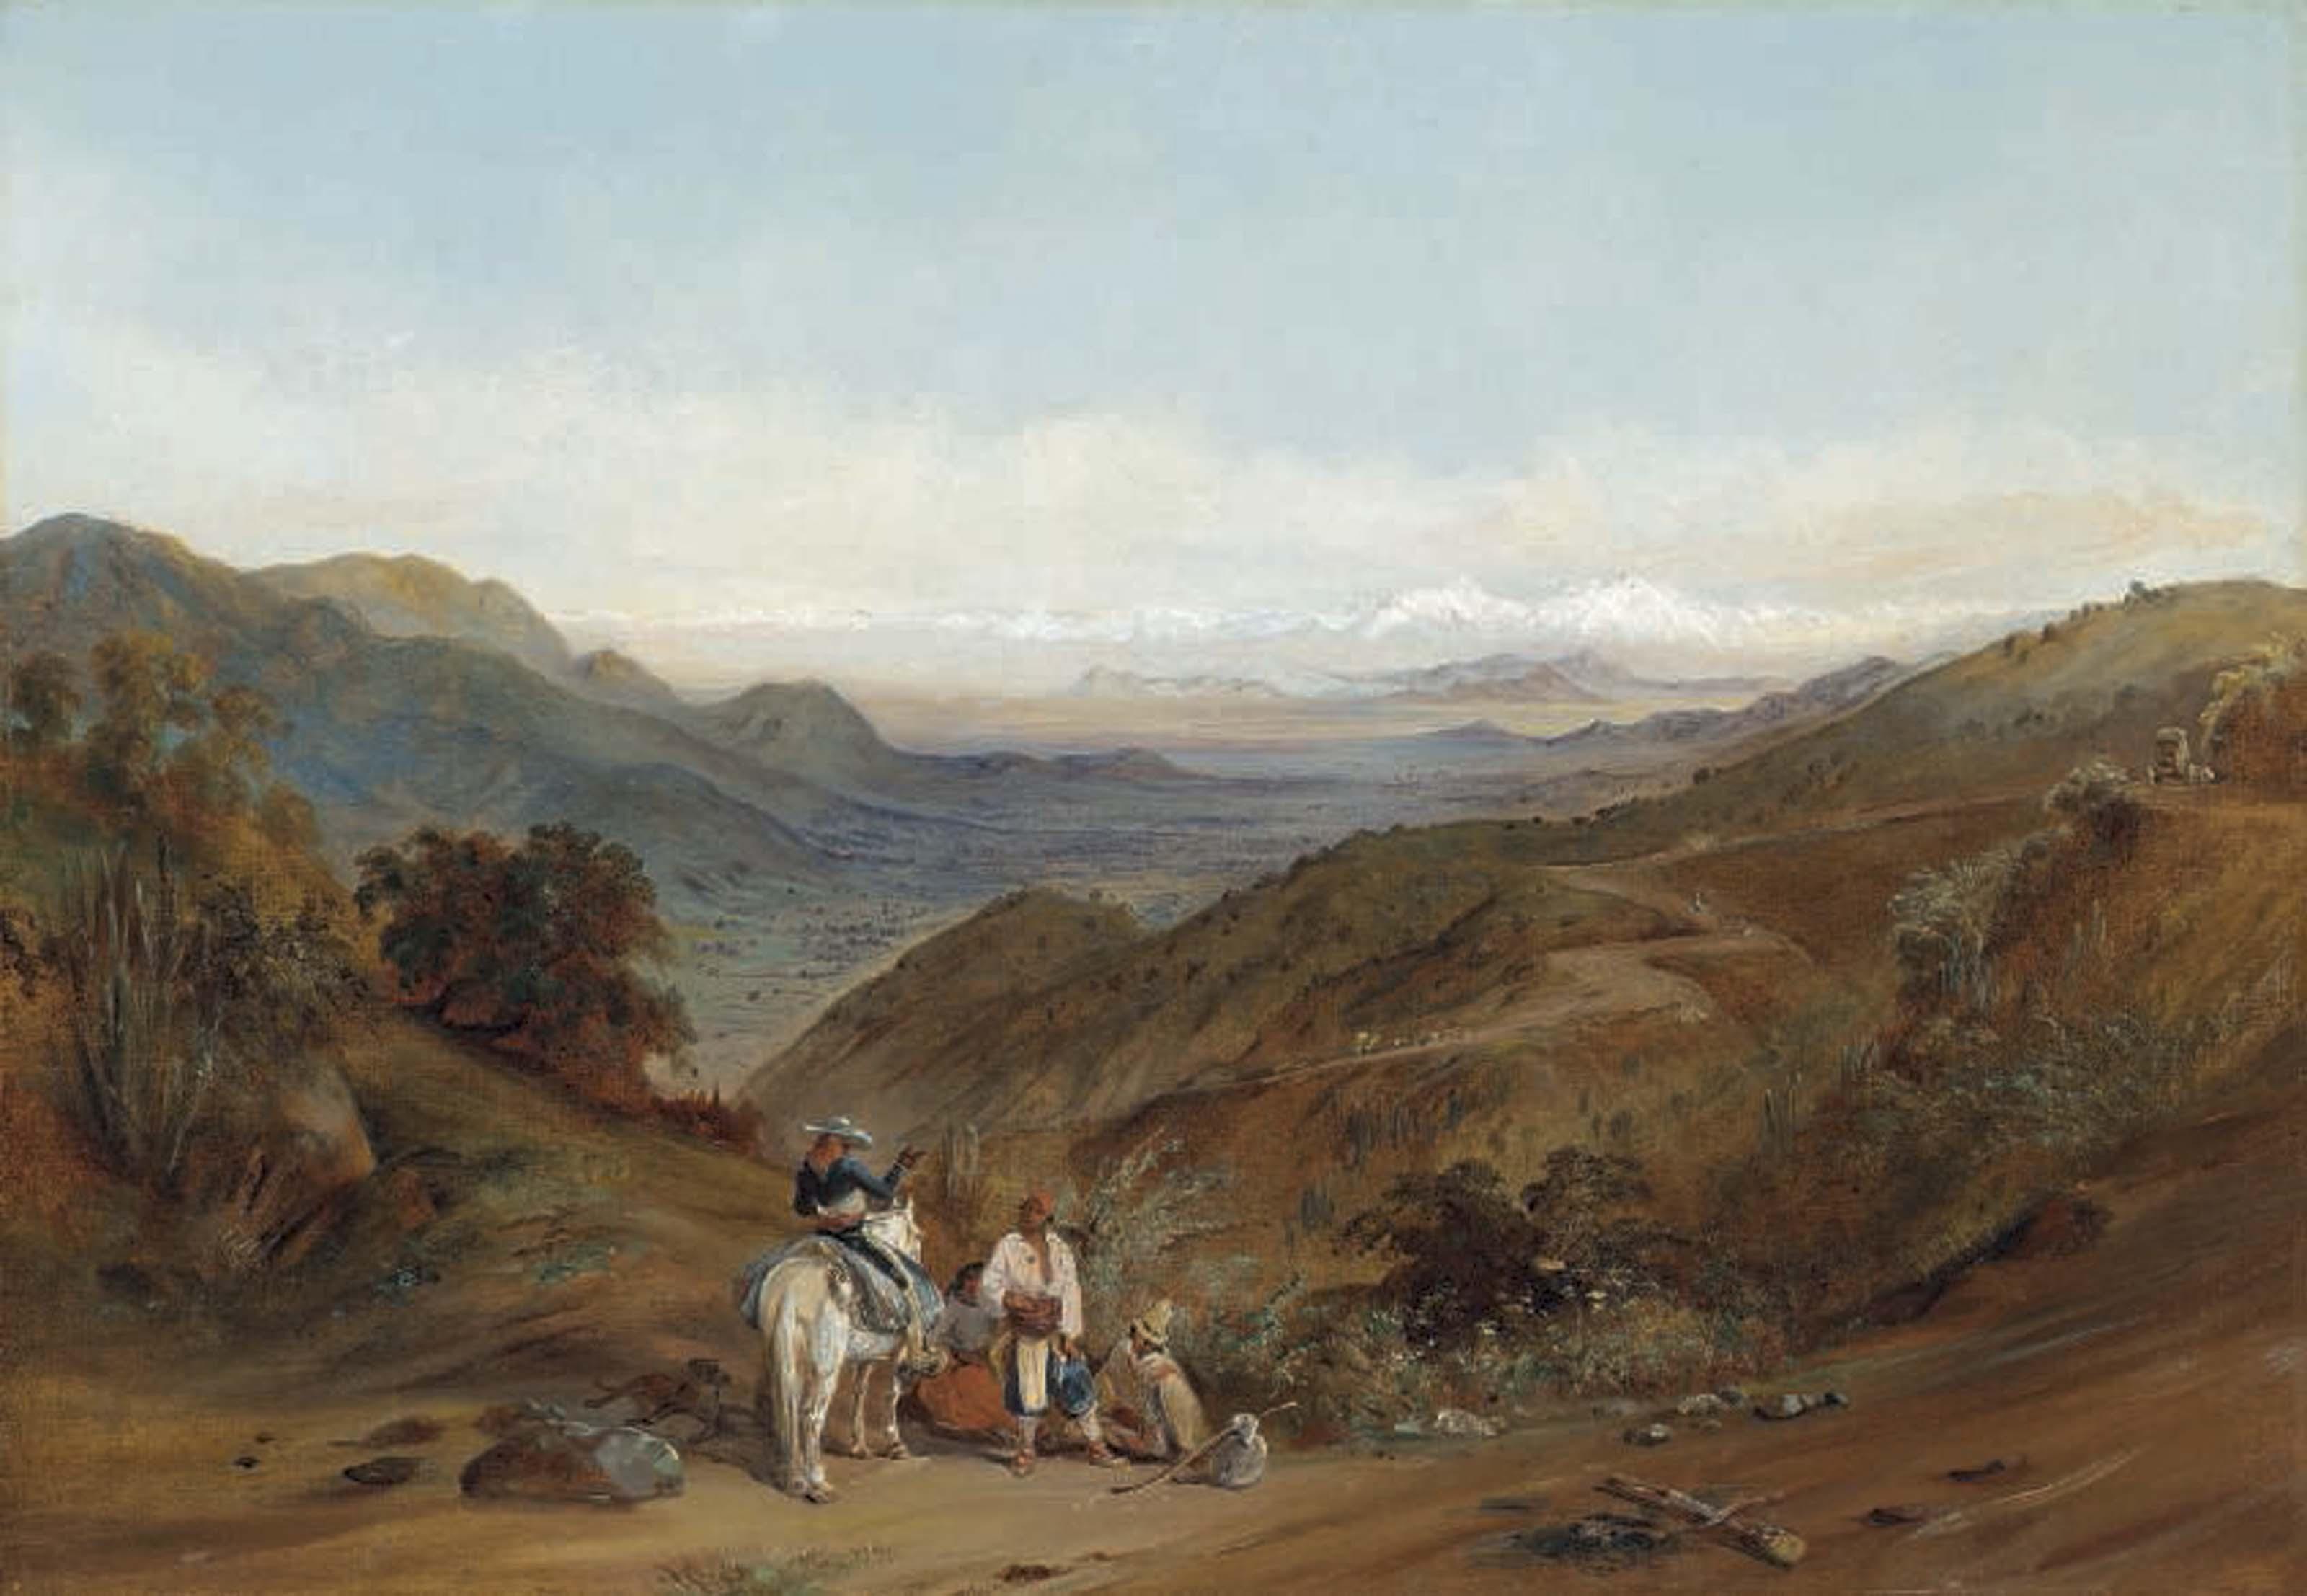 The road between Santiago and Valparaíso from the Prado hillside